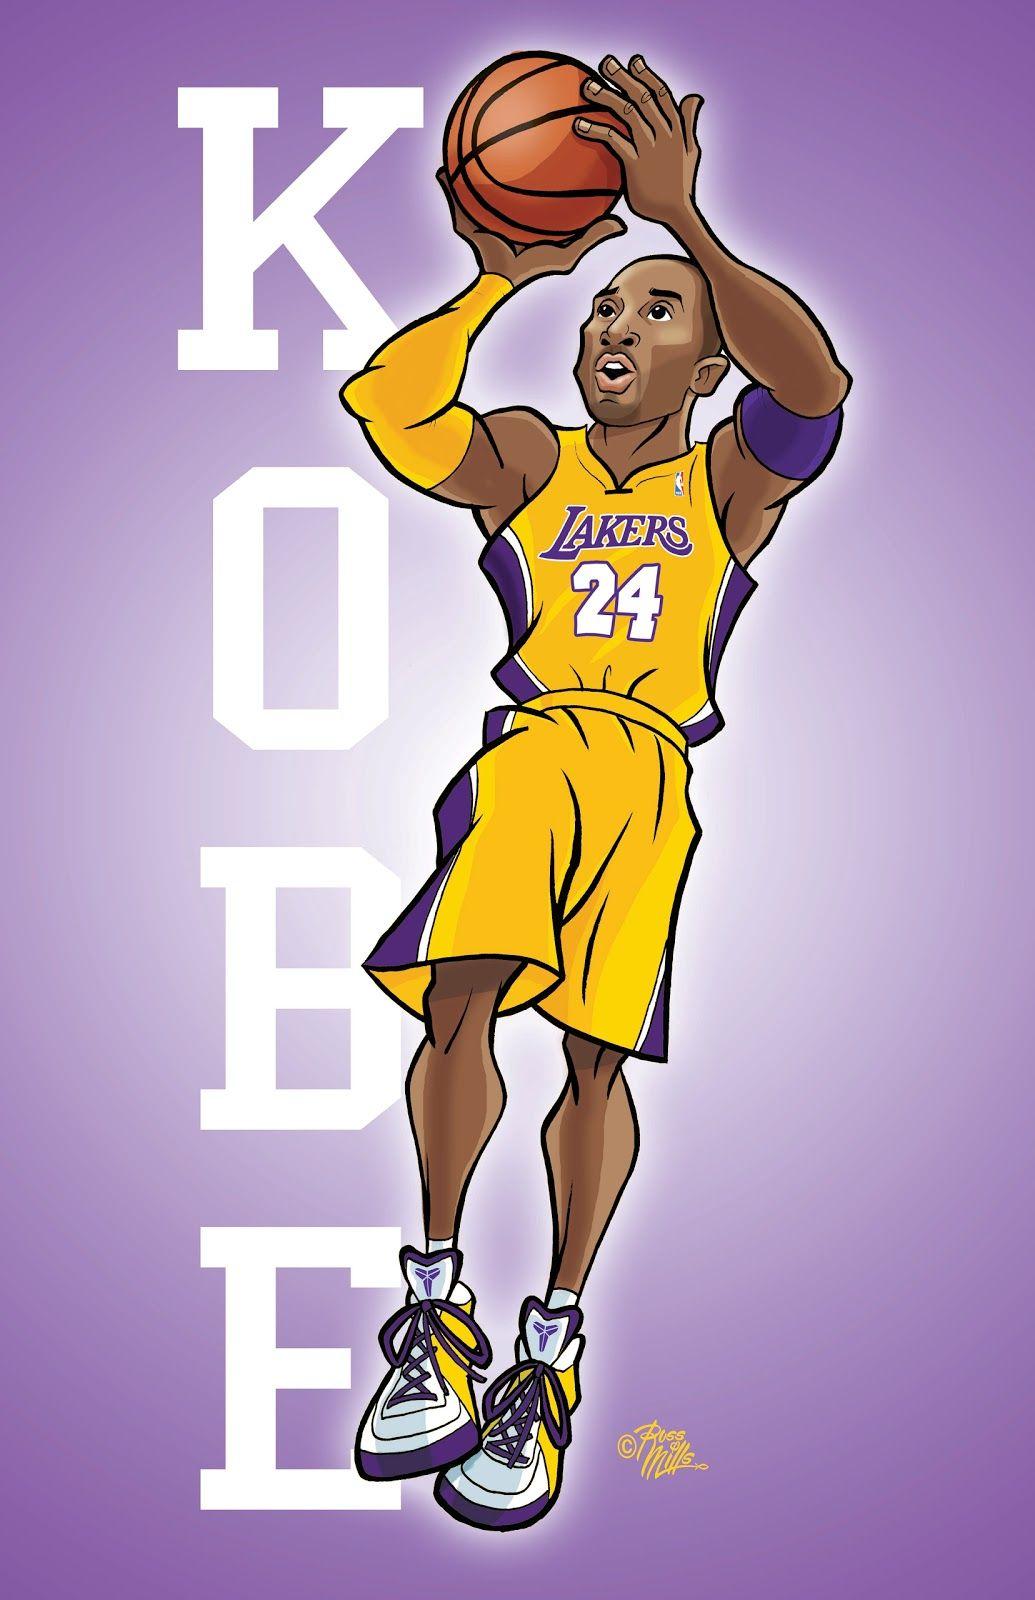 Kobe Bryant Wallpaper For Iphone Kobe Bryant Lakers Kobe